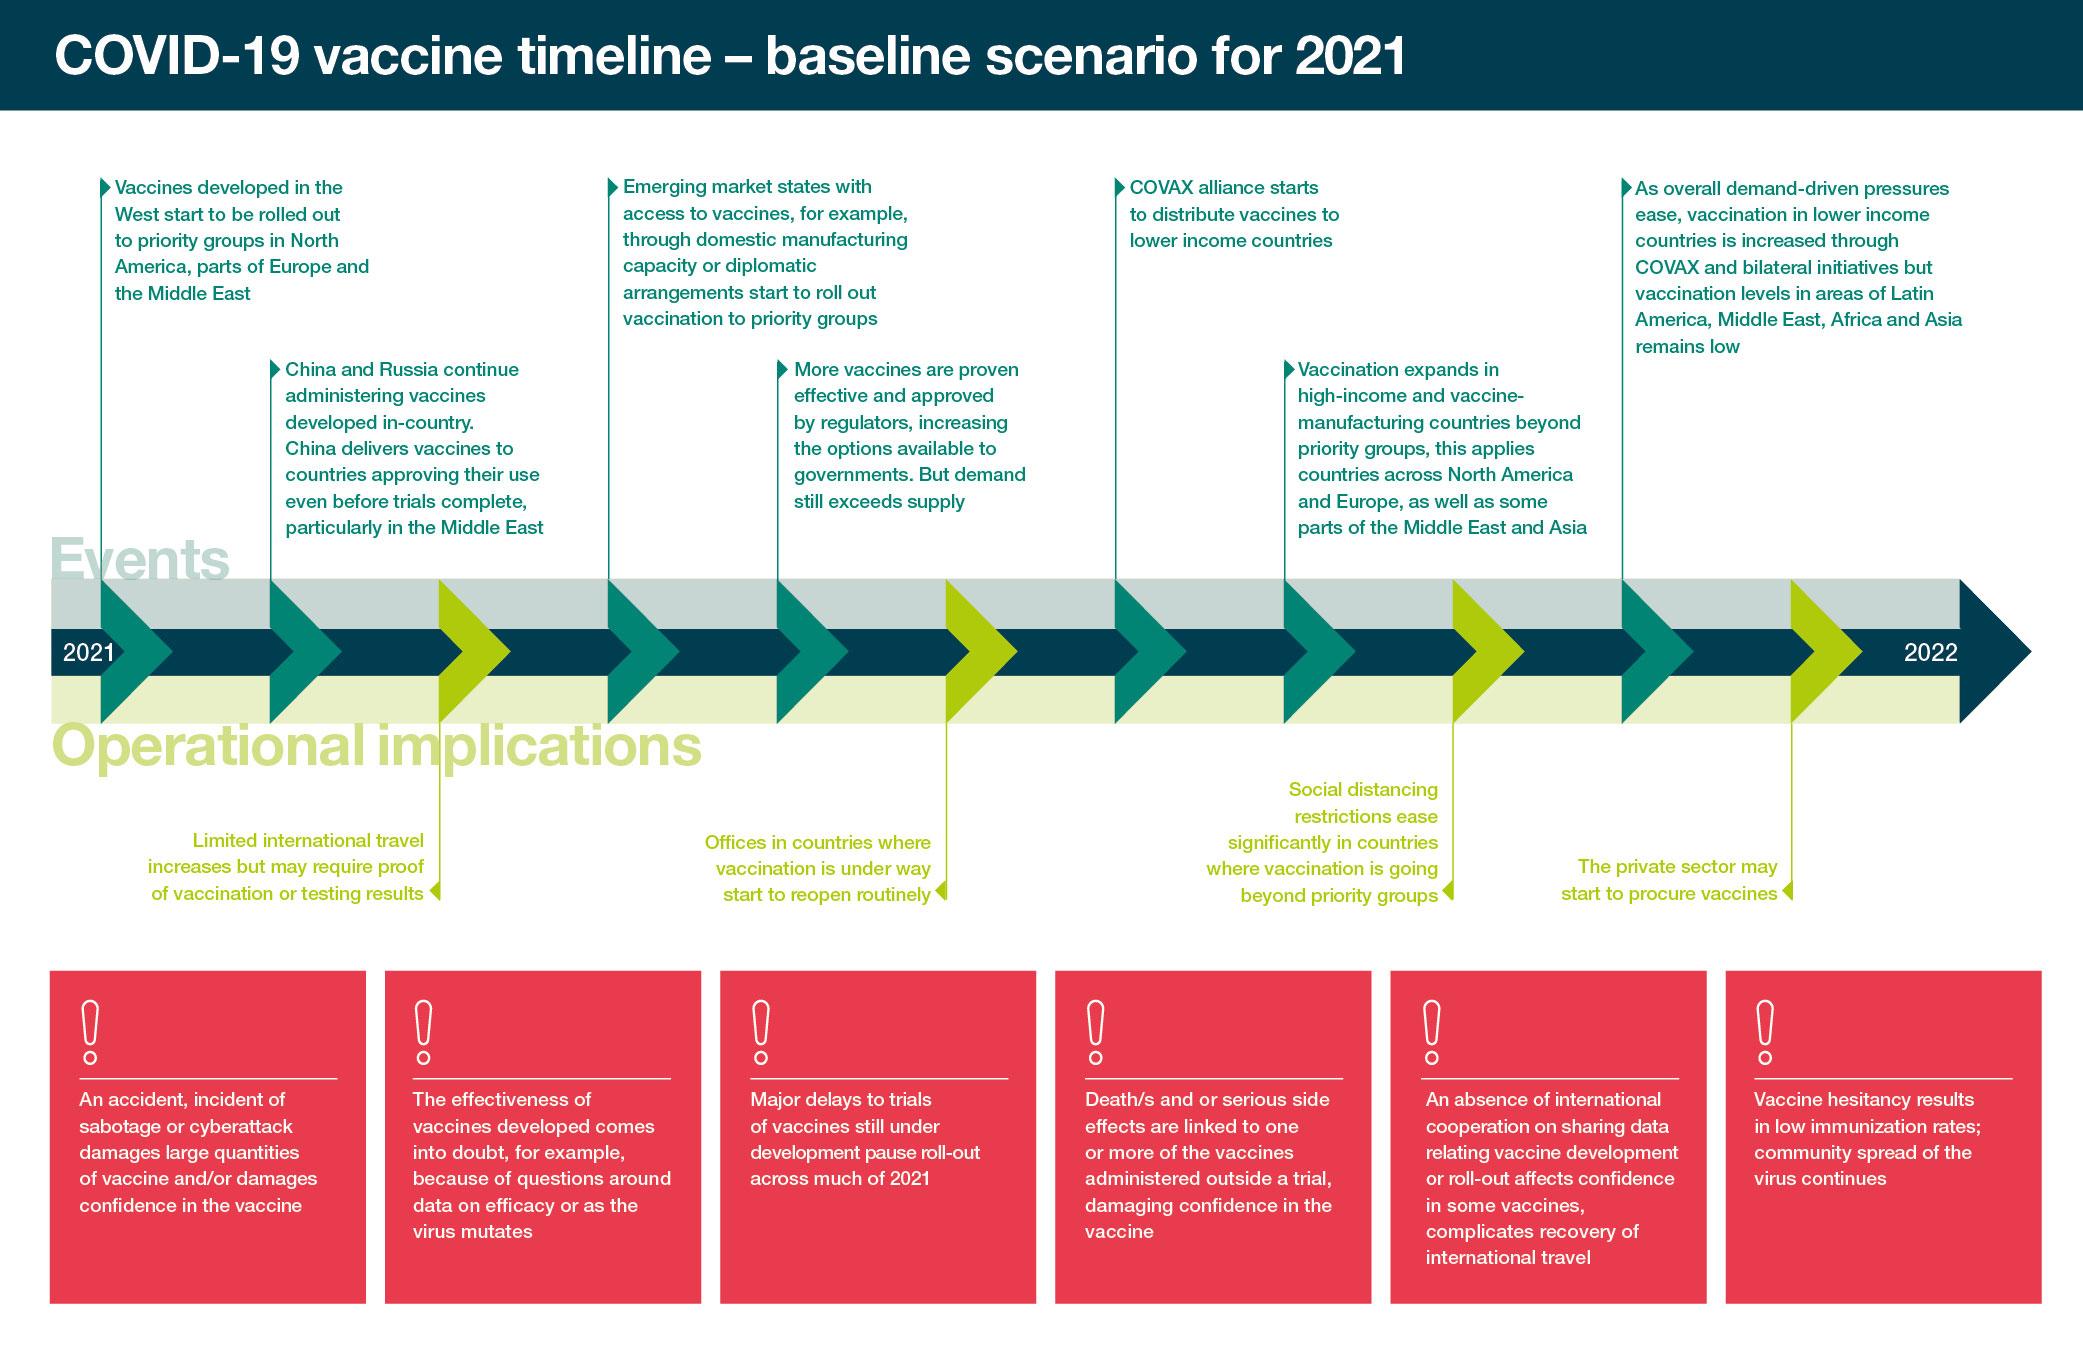 COVID-19 Vaccine timeline